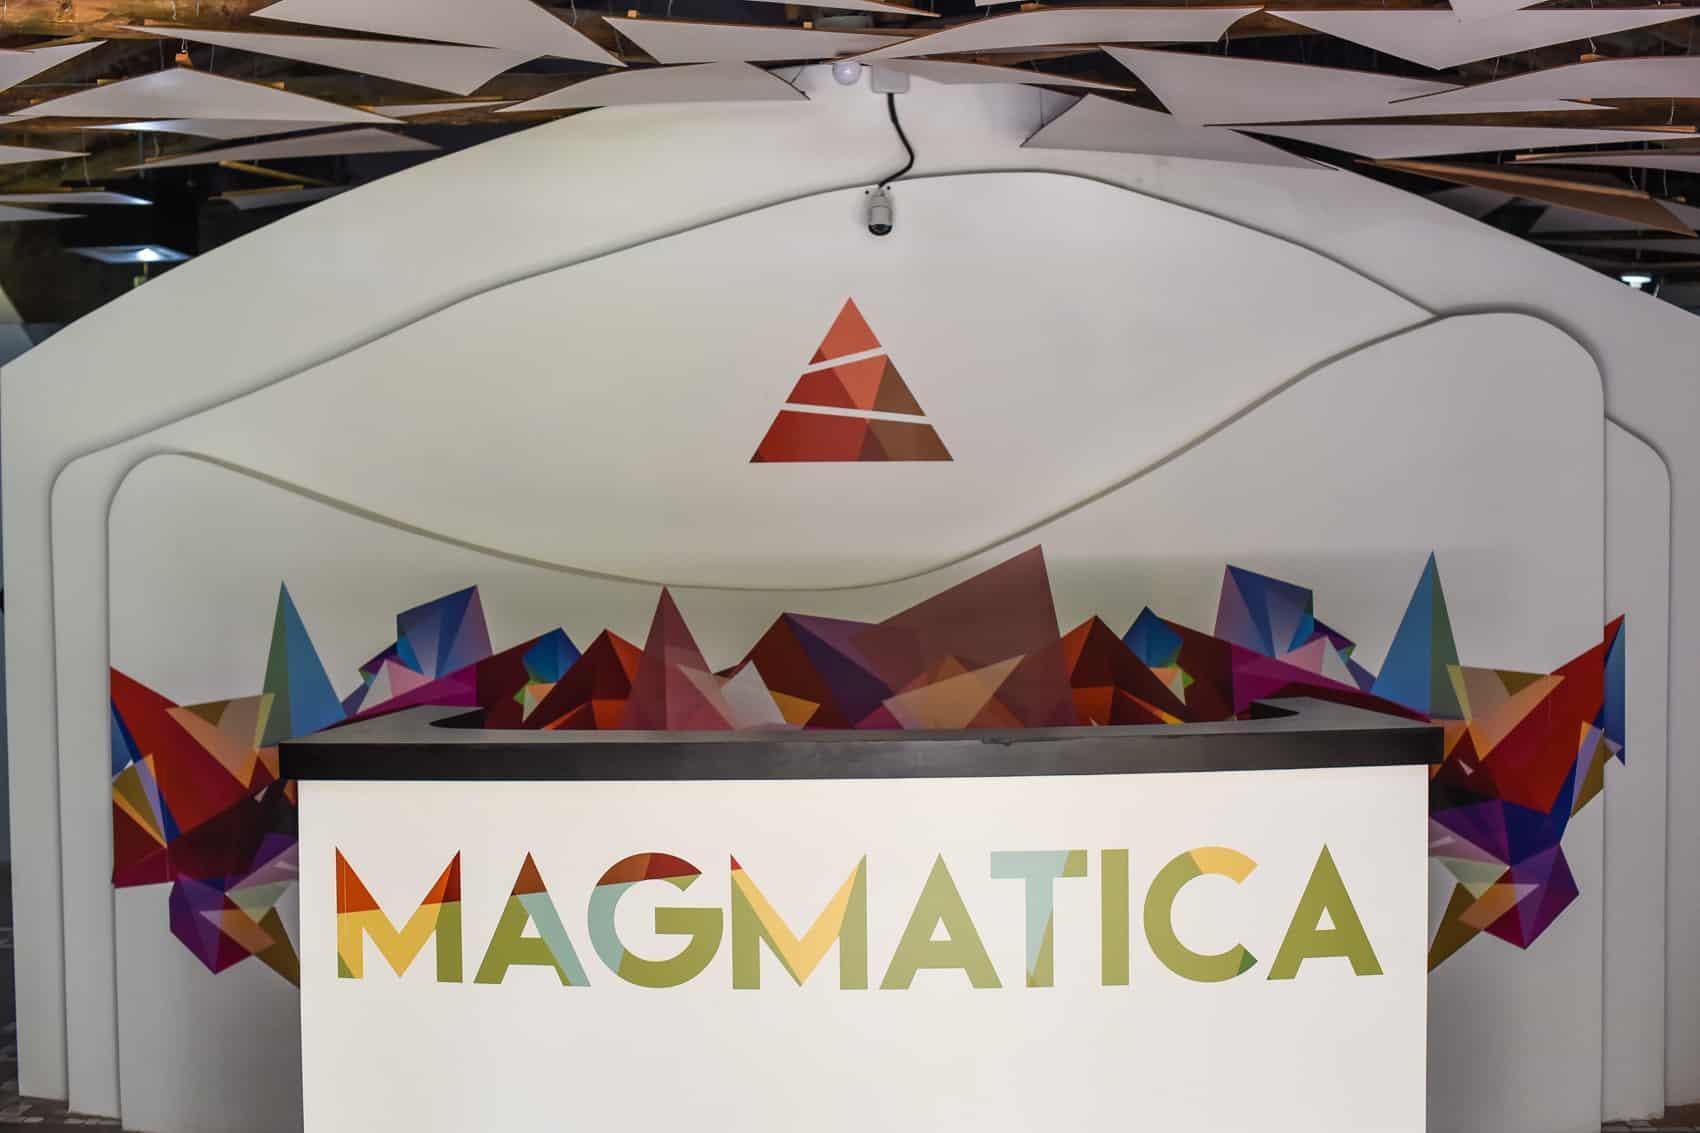 Earthquake simulator Magmática.